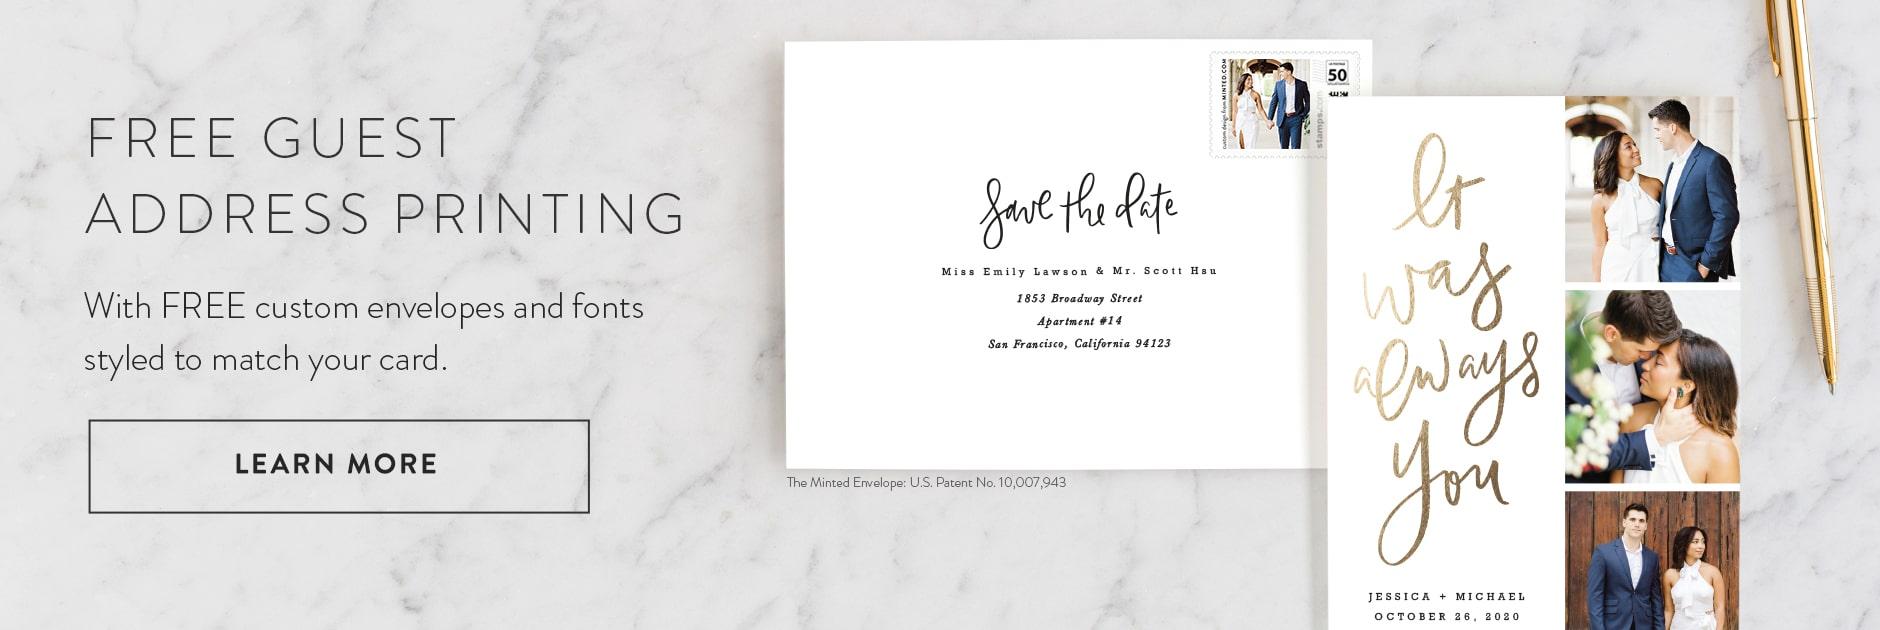 Free Custom Envelope